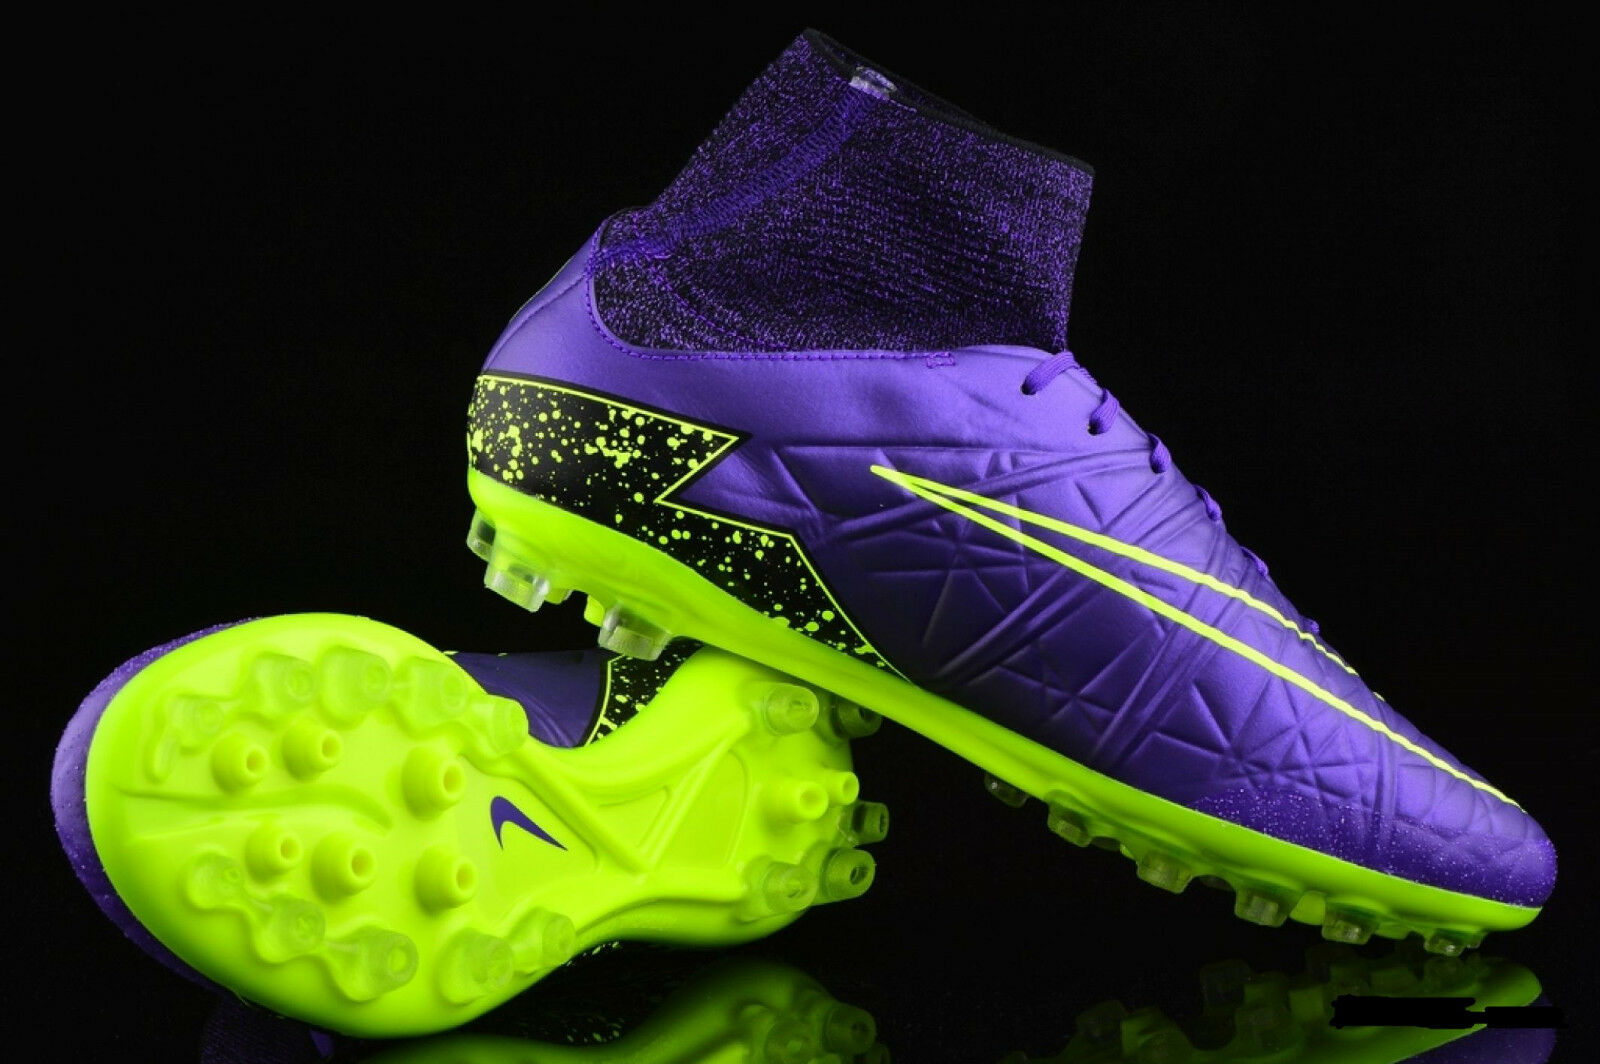 Nike hypervenom phatal II df EGR 747488-550 multinocken nuevo zapatos futbol 44,5